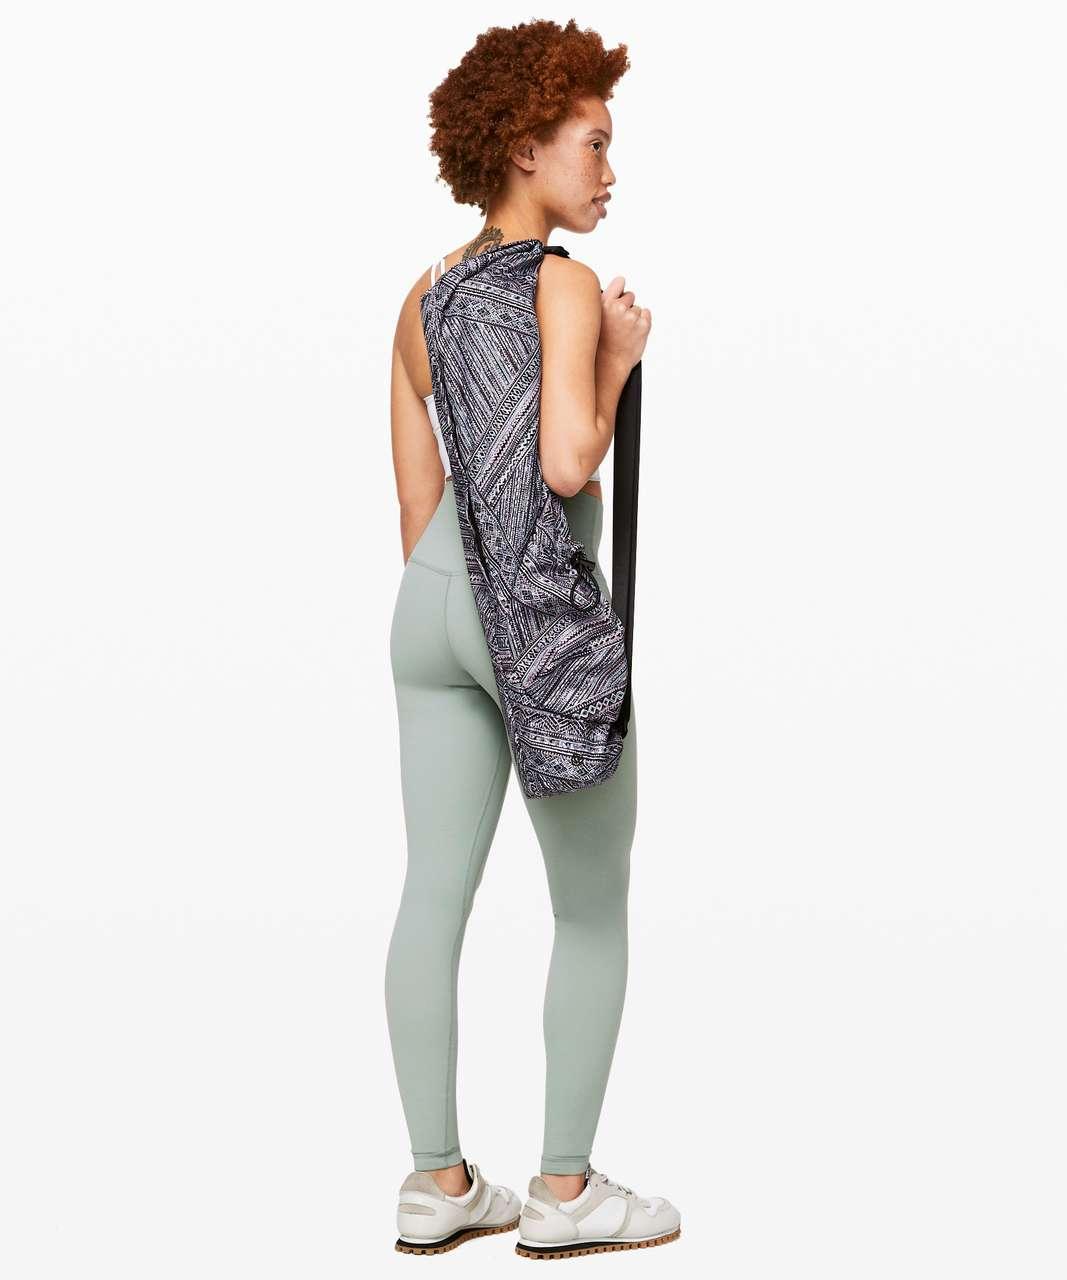 Lululemon The Yoga Mat Bag *16L - Tribal Pace White Black